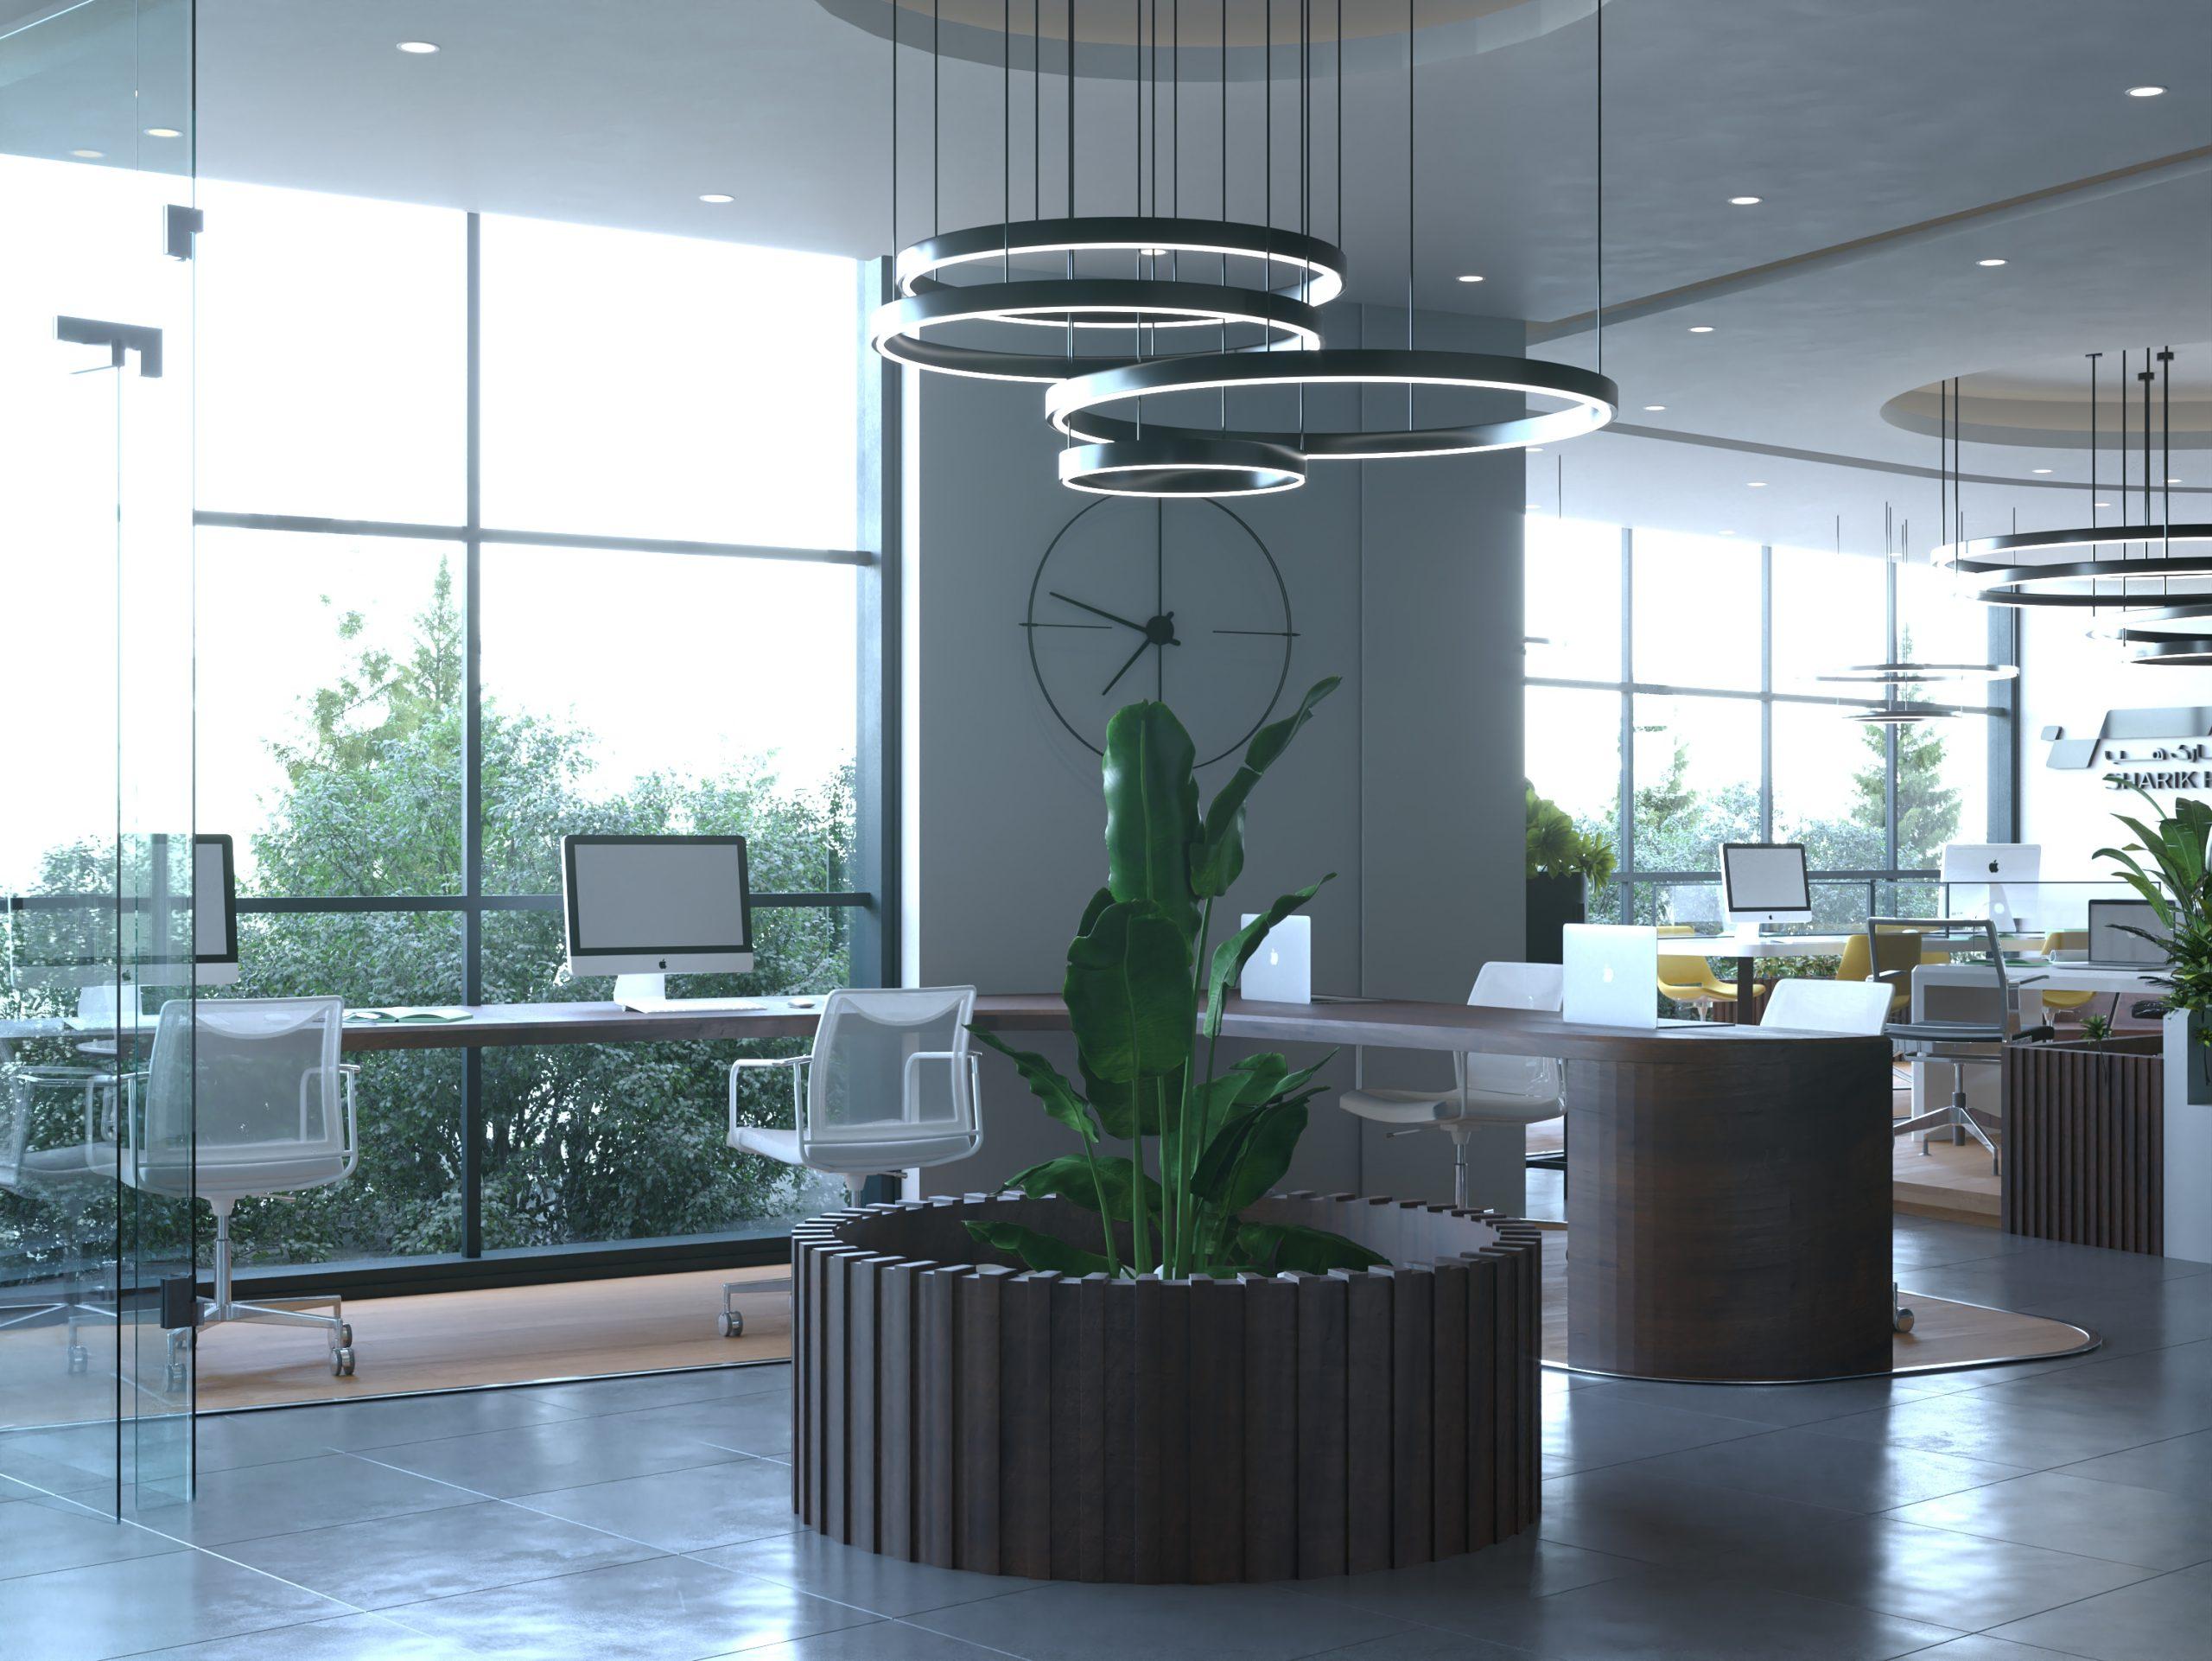 SHARIK HUB COMPANY DESIGN - SUN LIGHT - PLANTS - BIG WINDOW - DECORATION - LABTOP